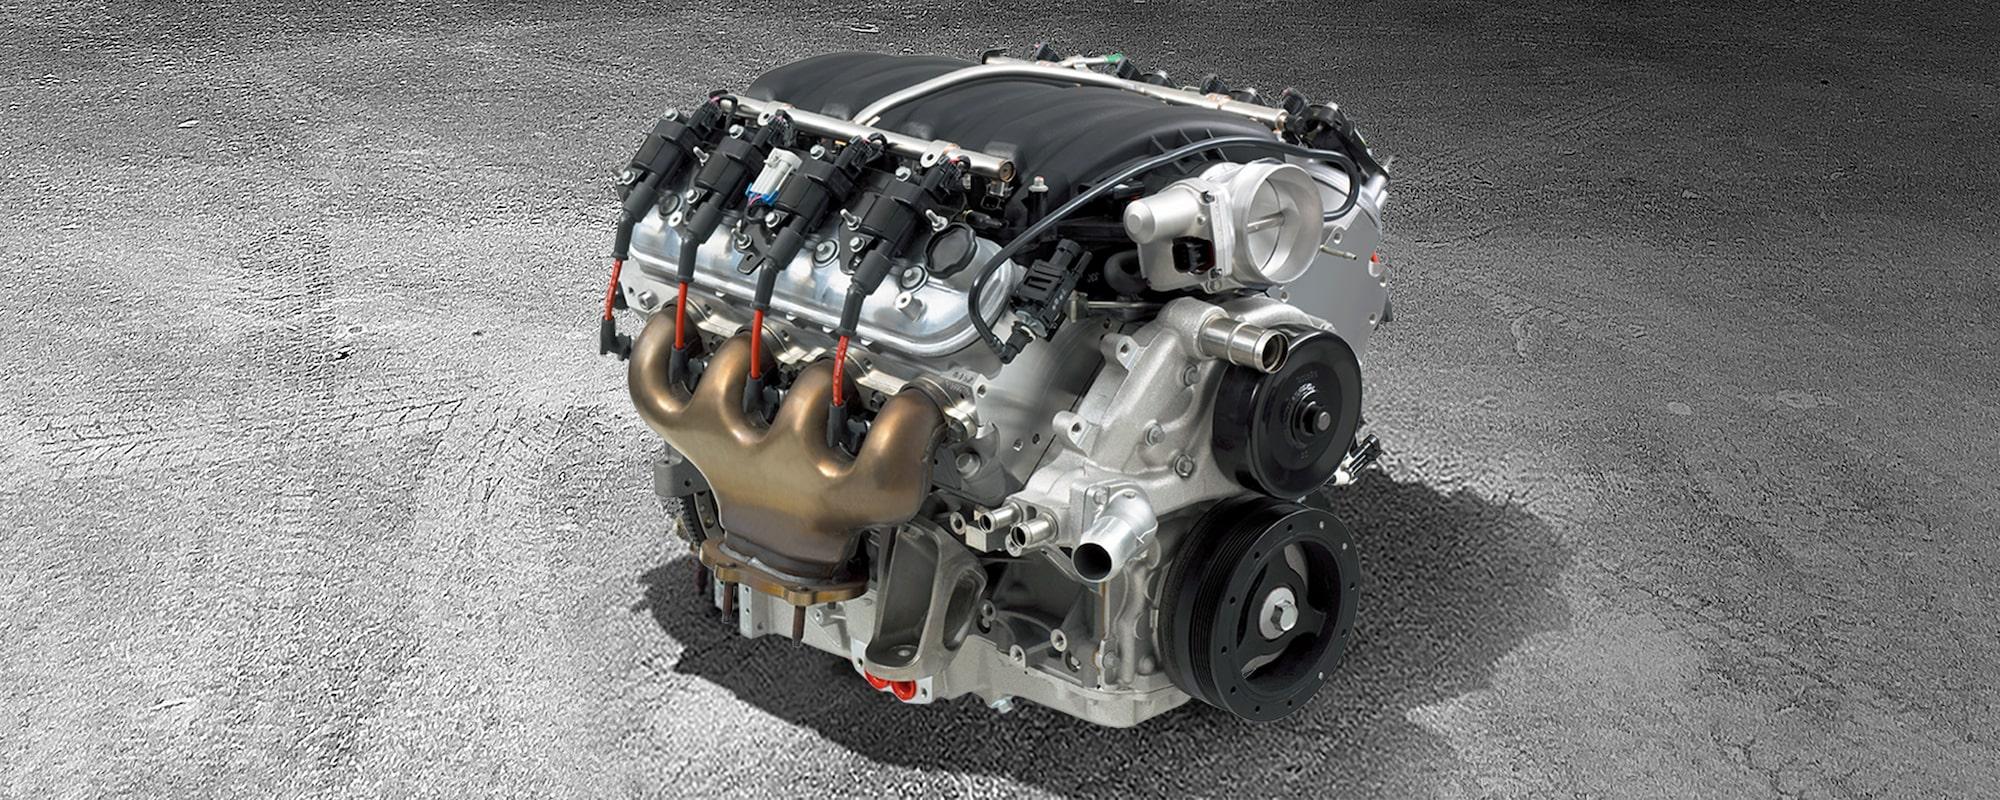 C6 Corvette Transmission Harness Diagram Schematic Wiring Ls7 Crate Engine Race Chevrolet Performancerhchevrolet At